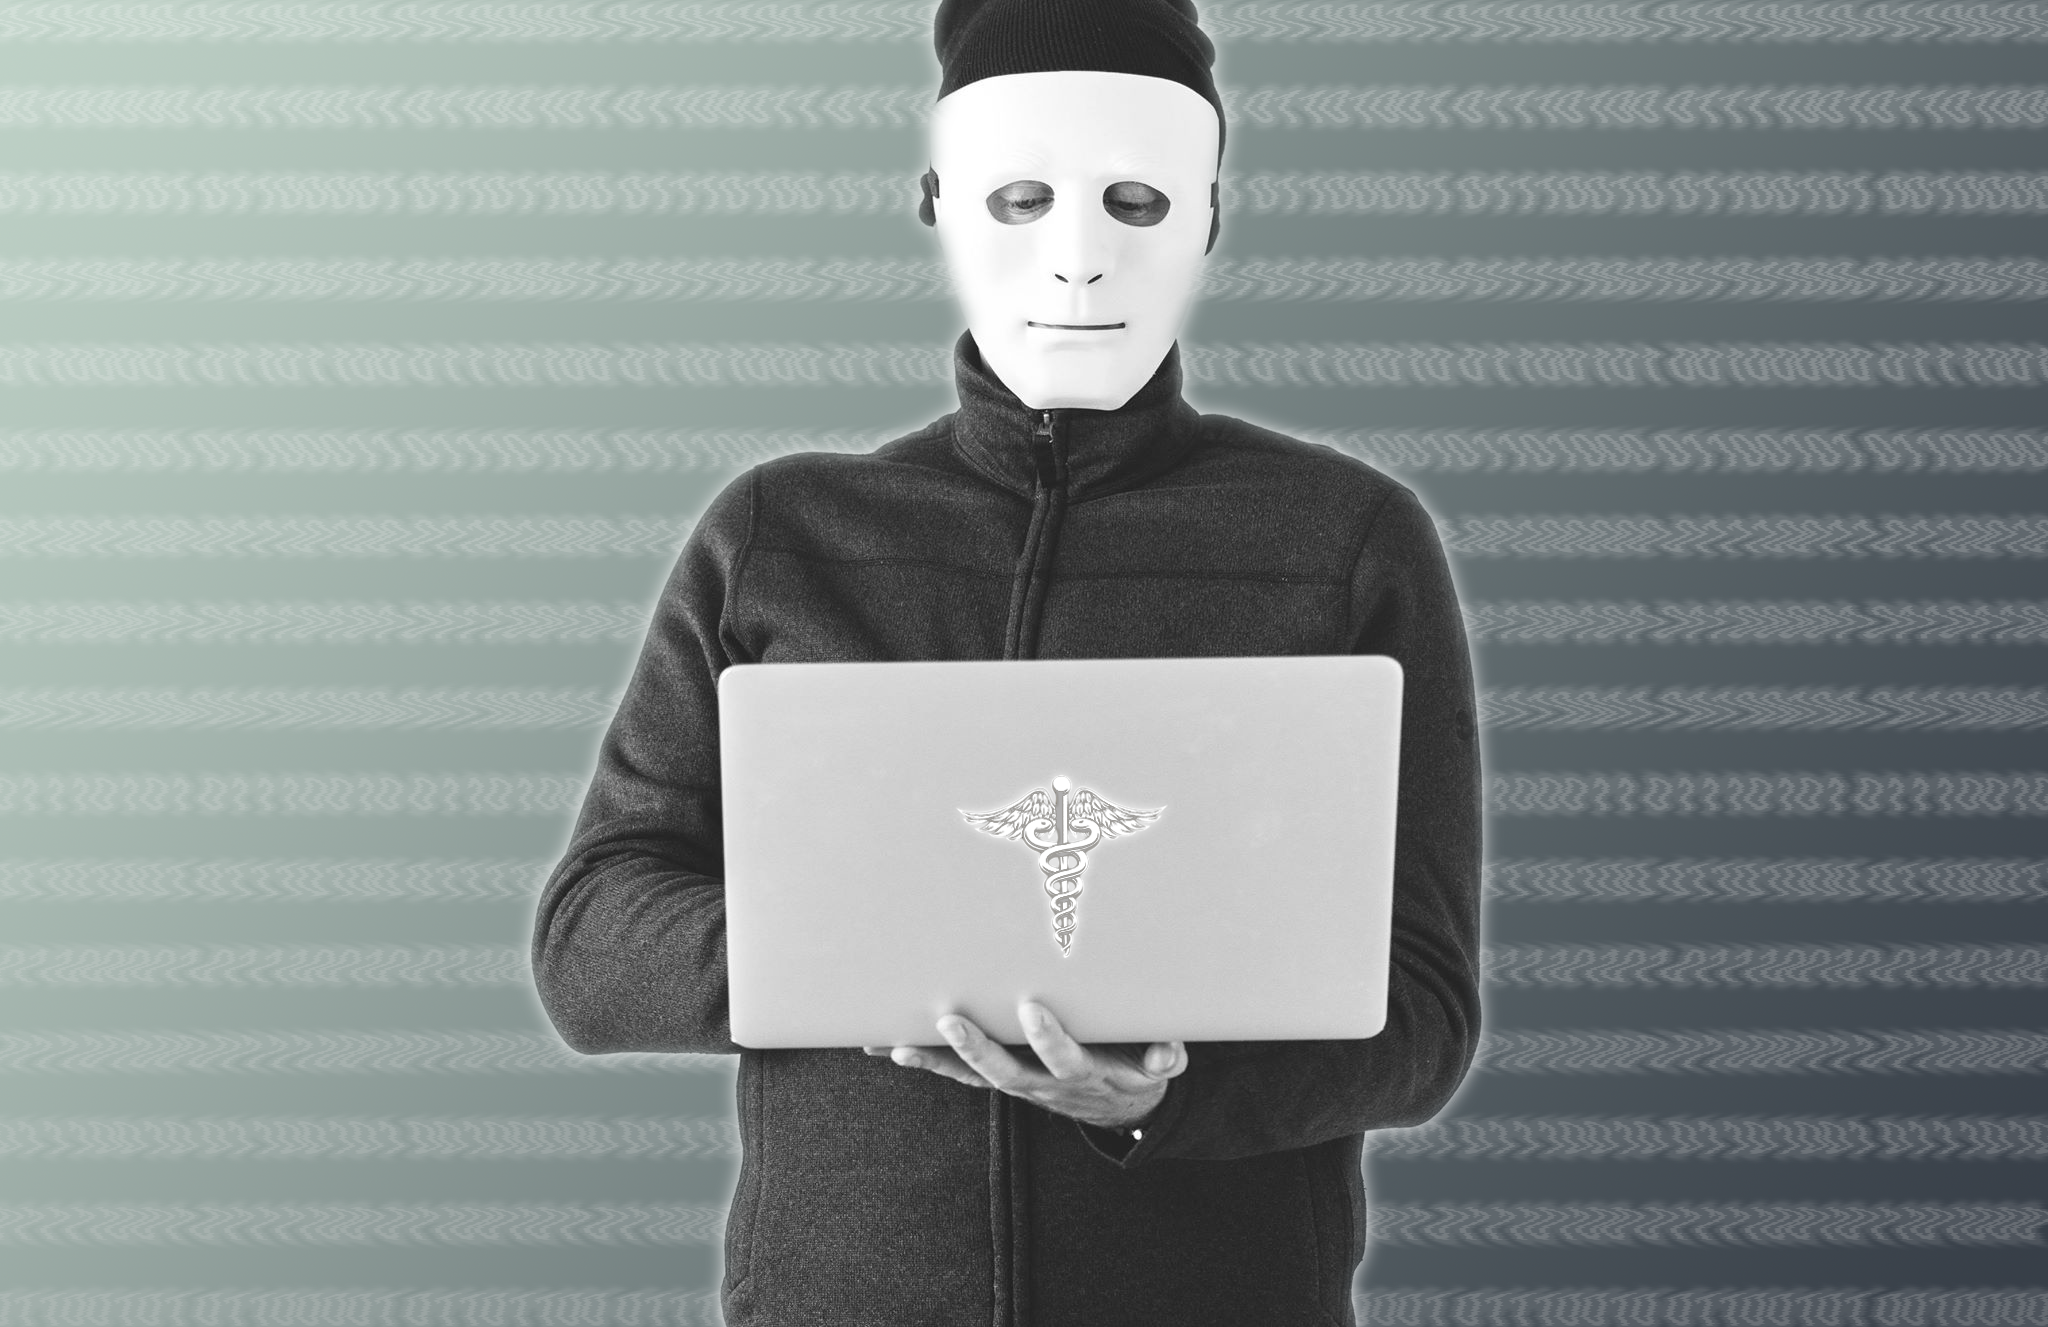 /data-privacy-security-in-healthcare-8bb15e203e56 feature image